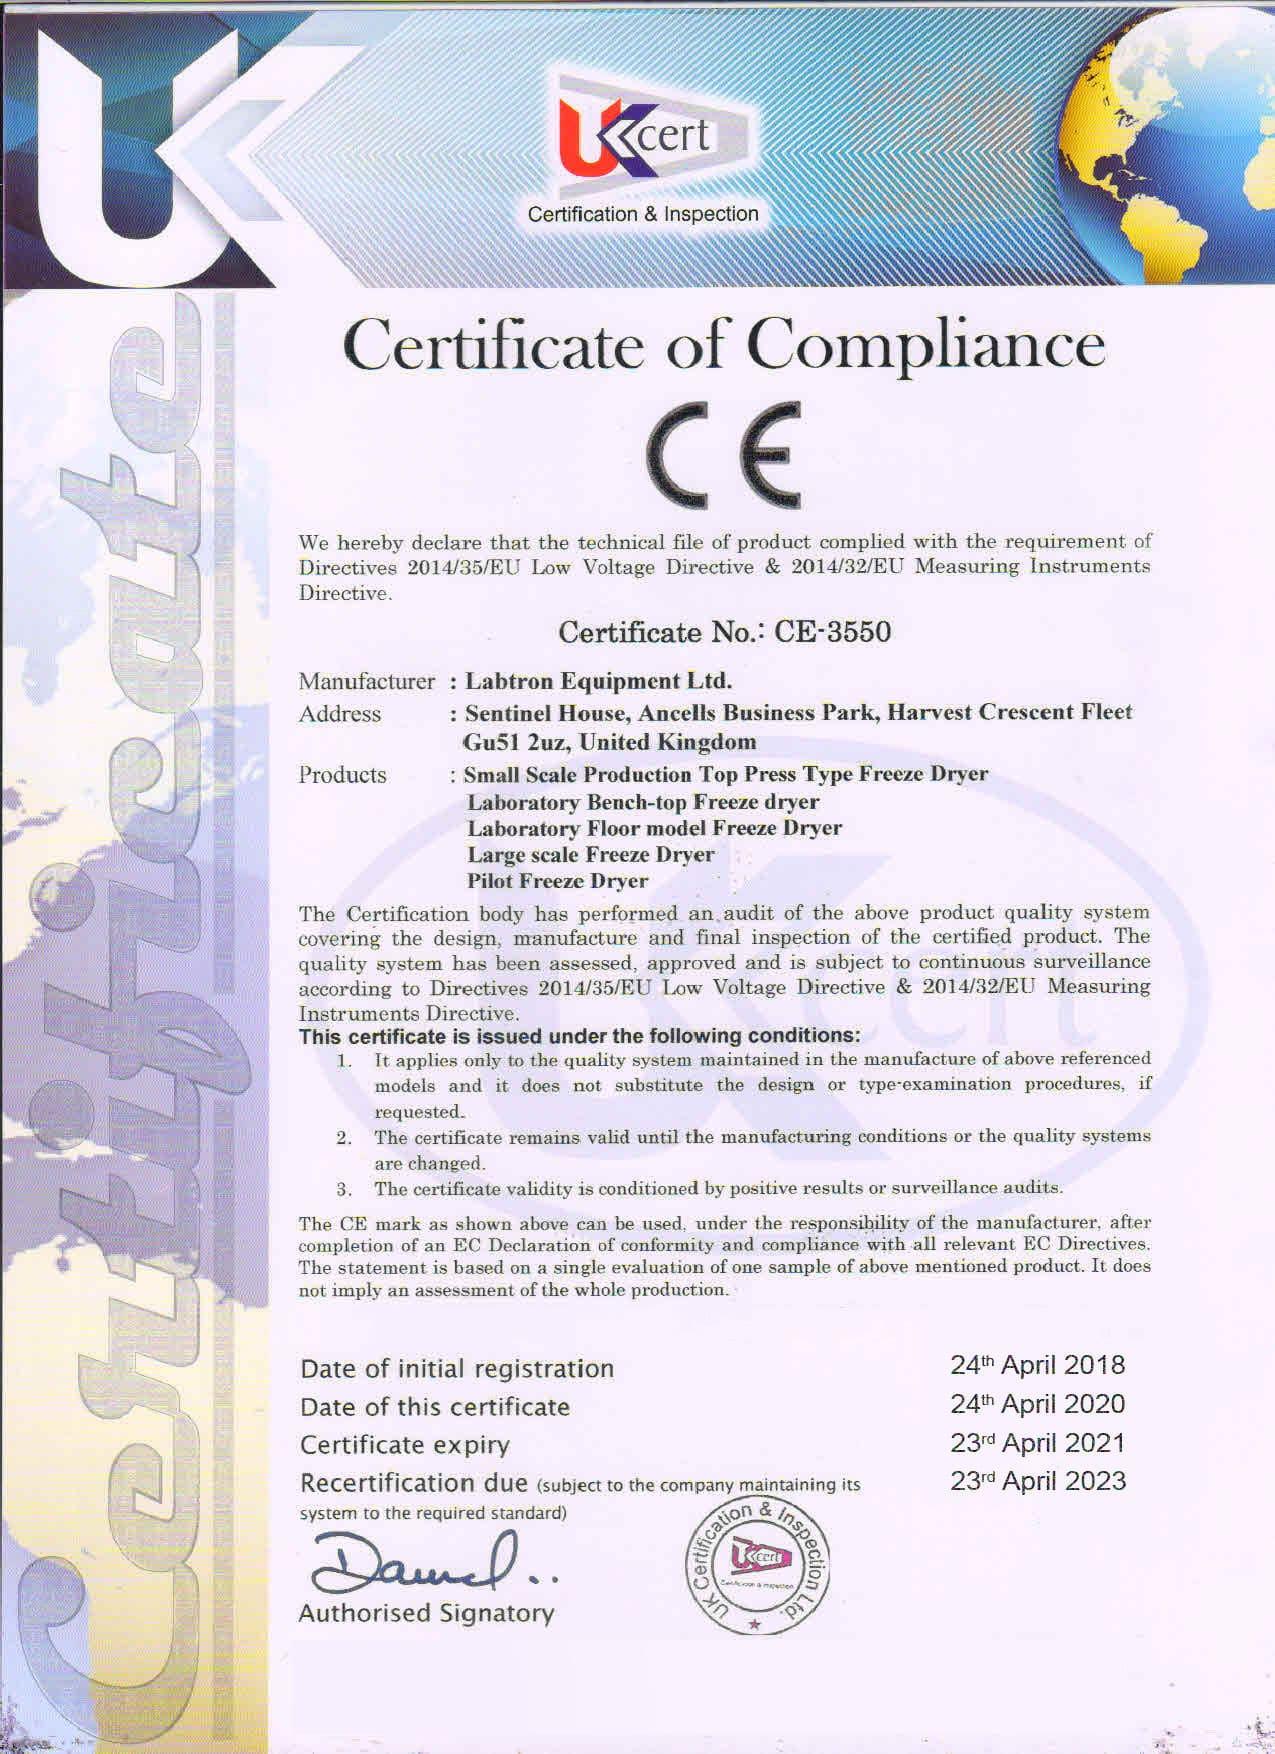 Labtron Equipment Ltd. Certificate of Compliance CE-3550 : Labtron Certification